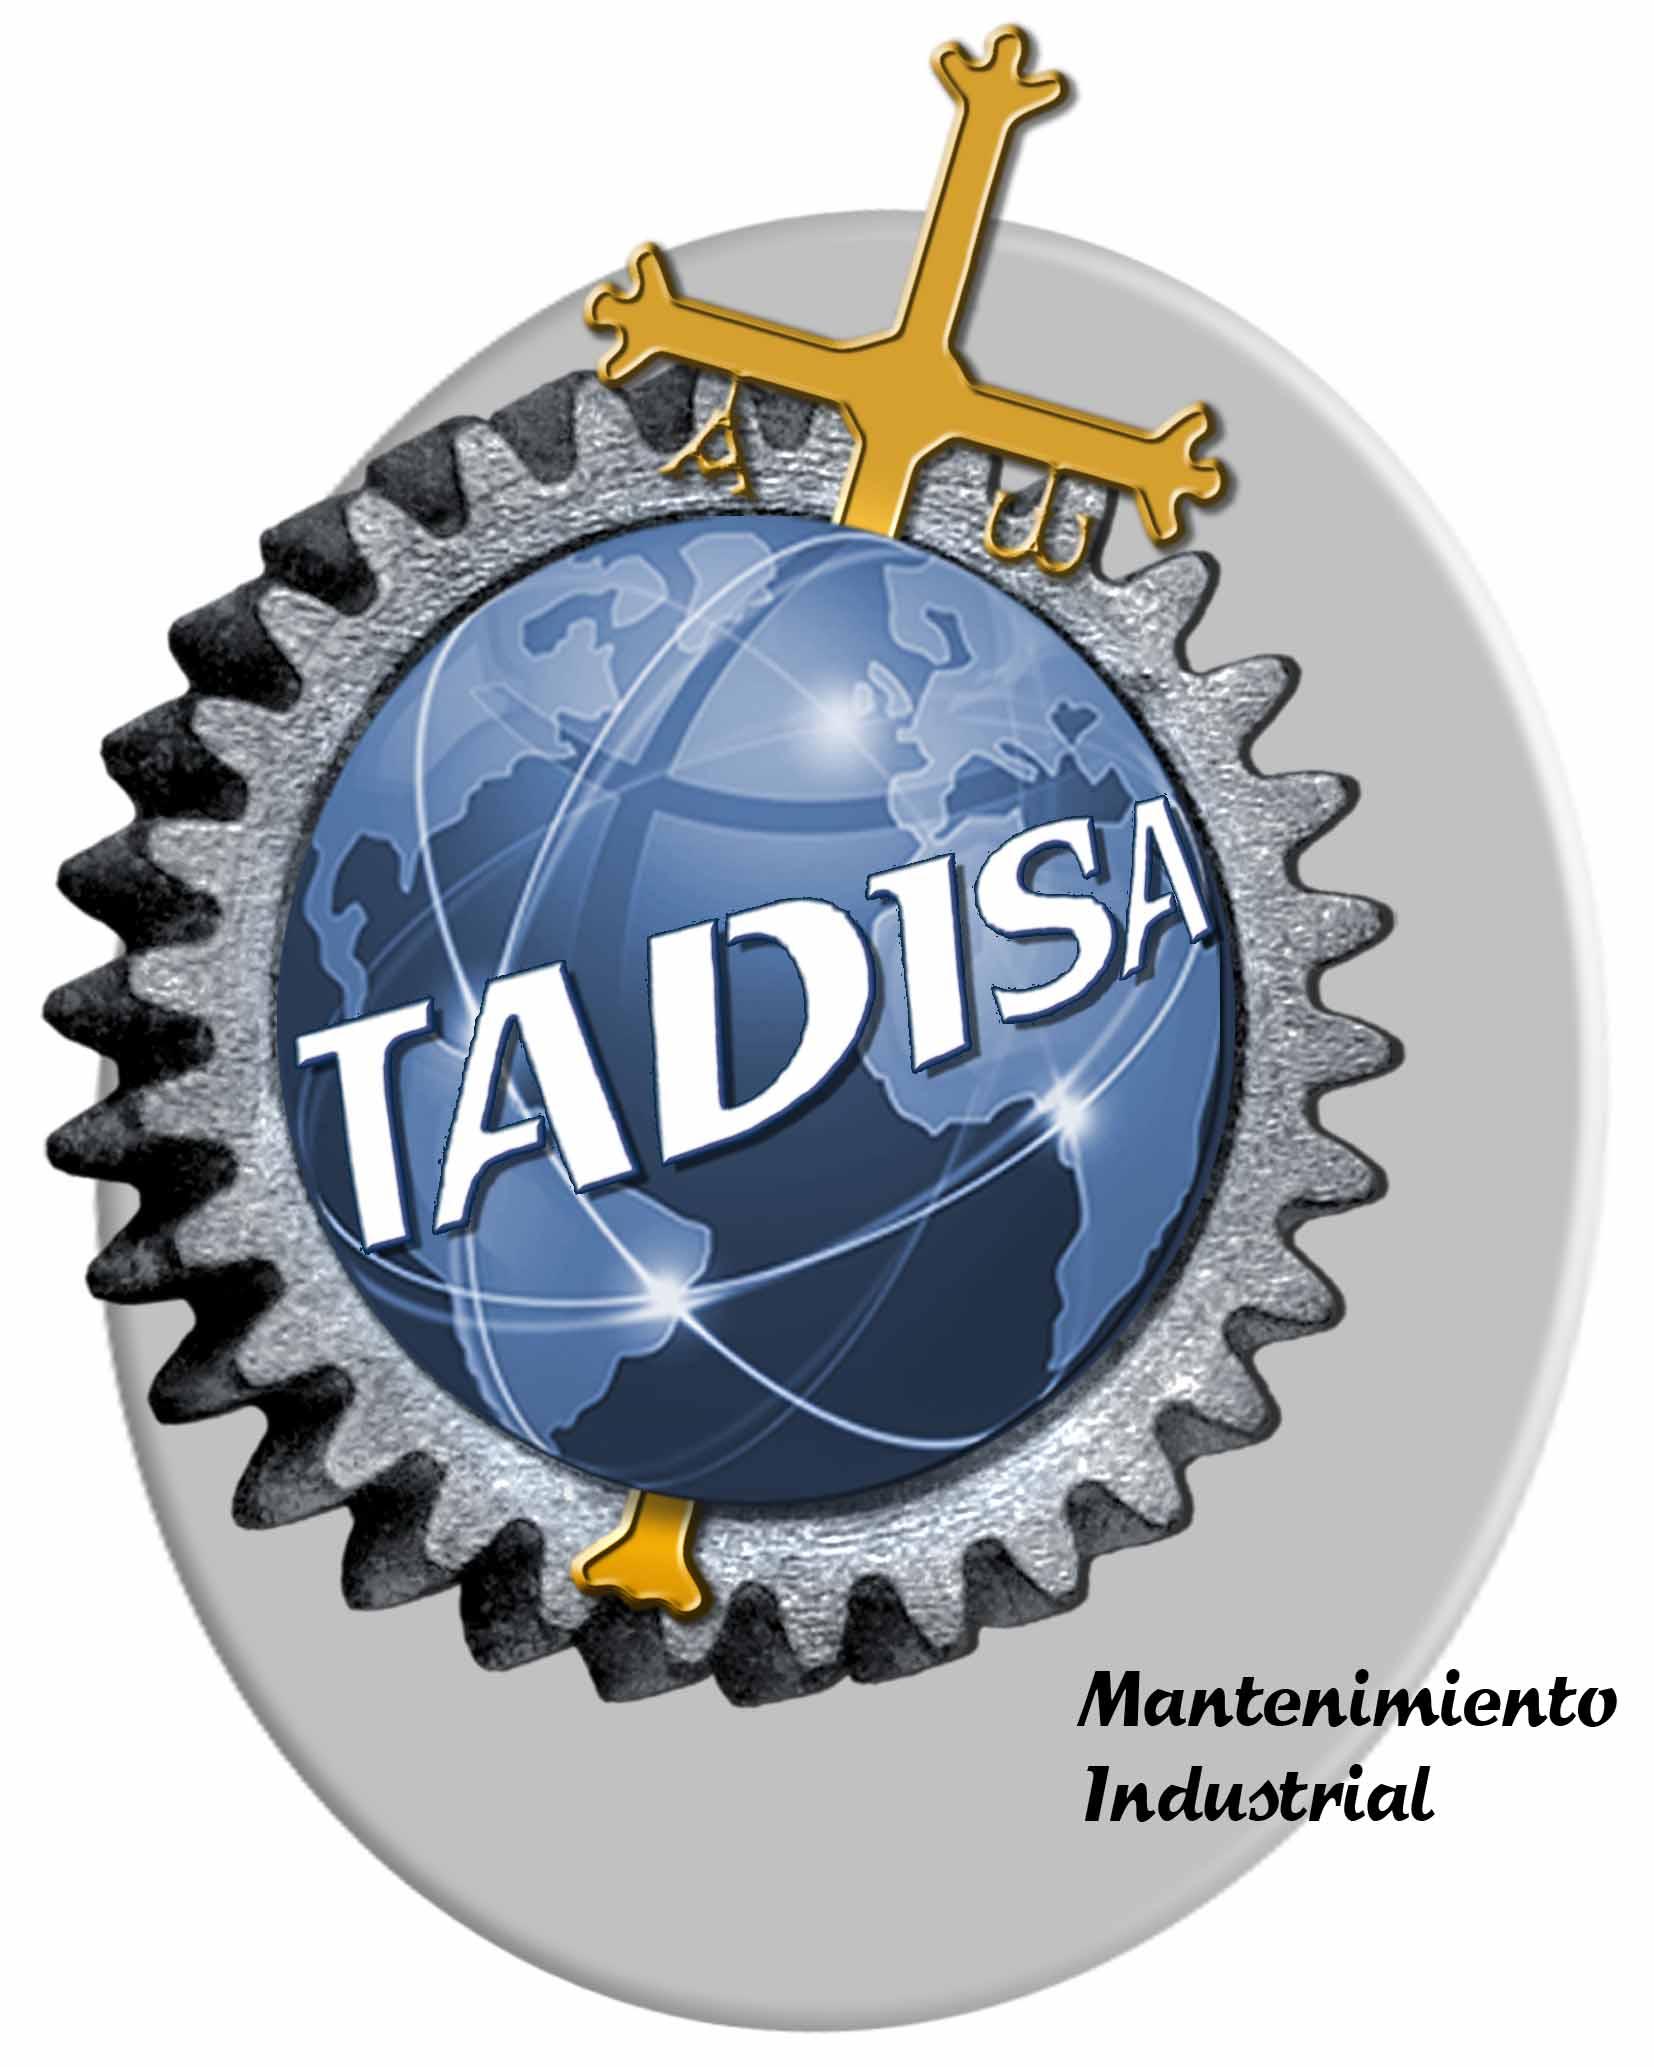 Logo Tadisa Mantenimiento Industrial, S.L.